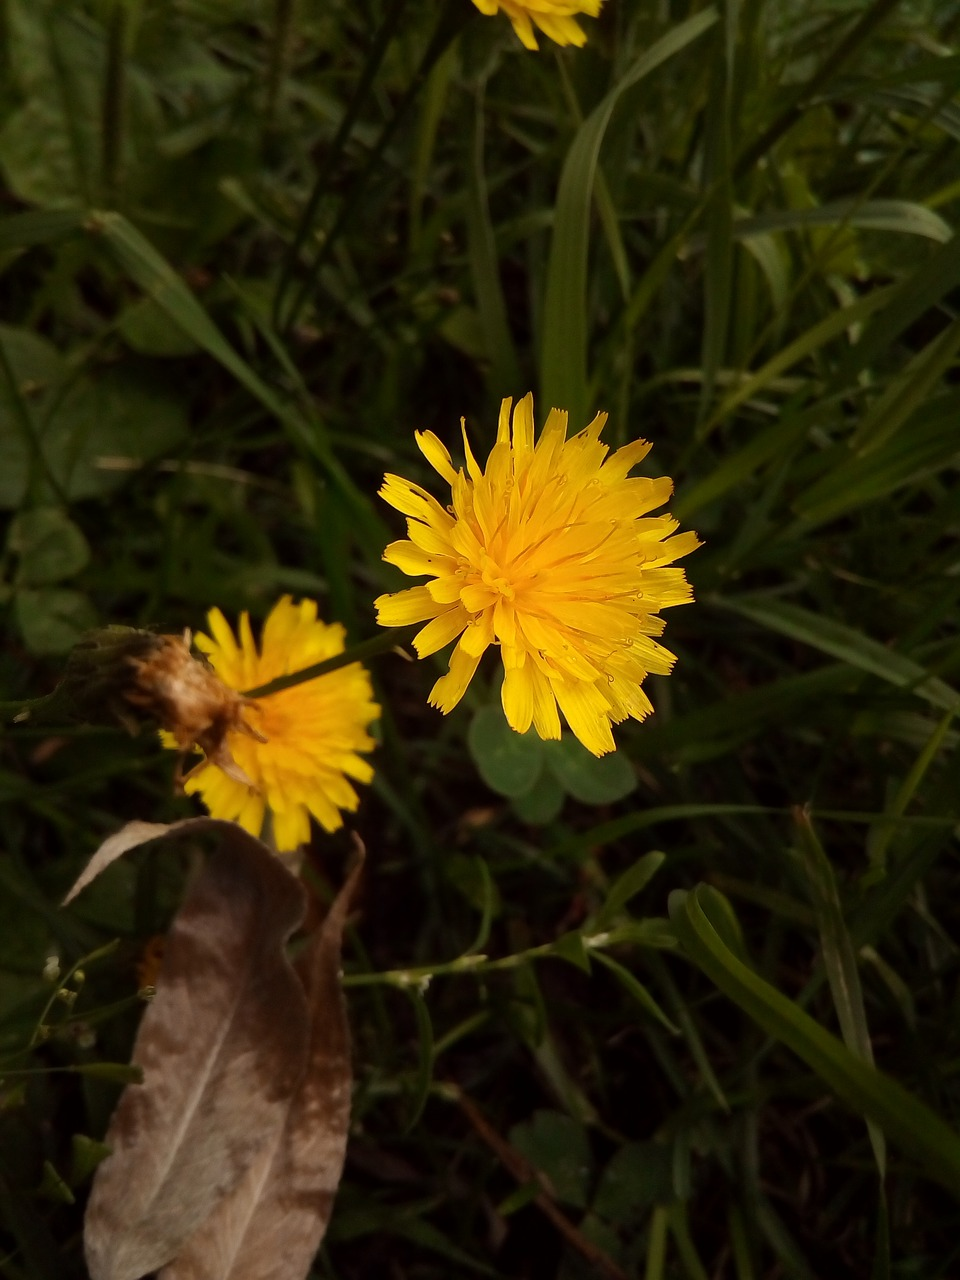 Yellowflowerwild Plantsautumn Hawkbit Free Photo From Needpix